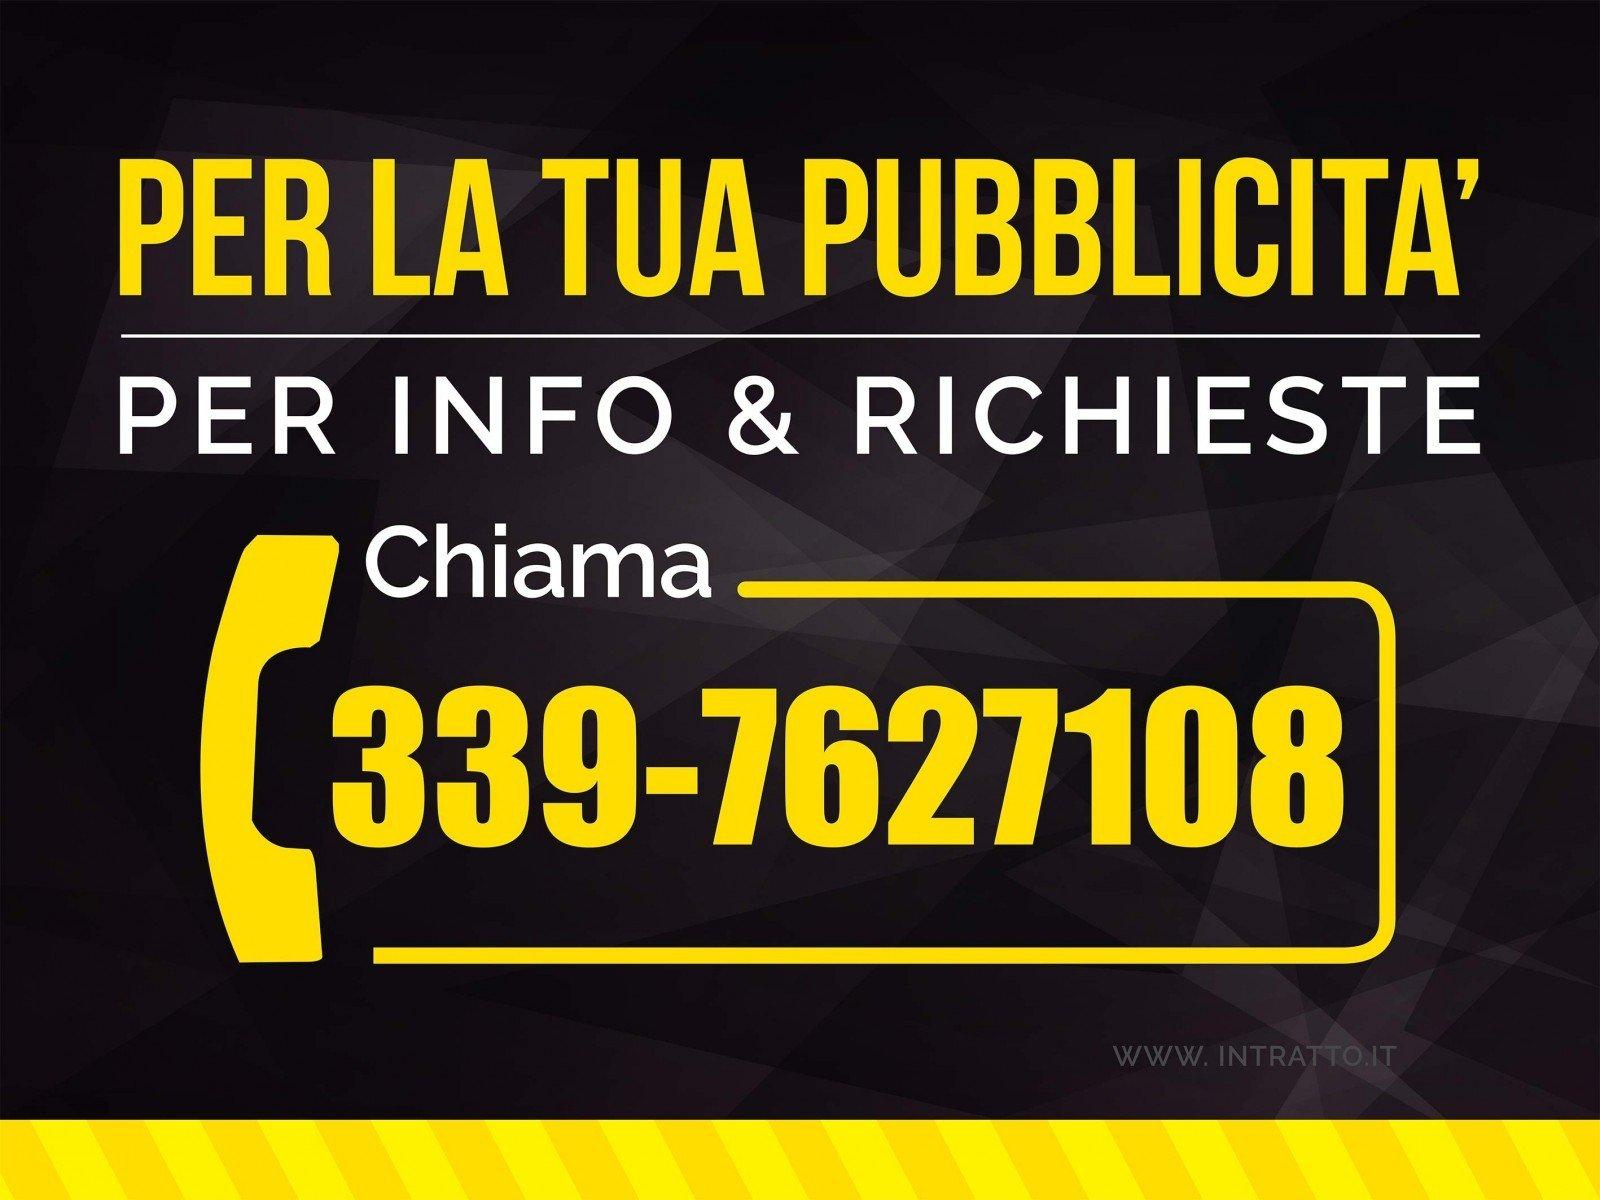 chiama-3397627108